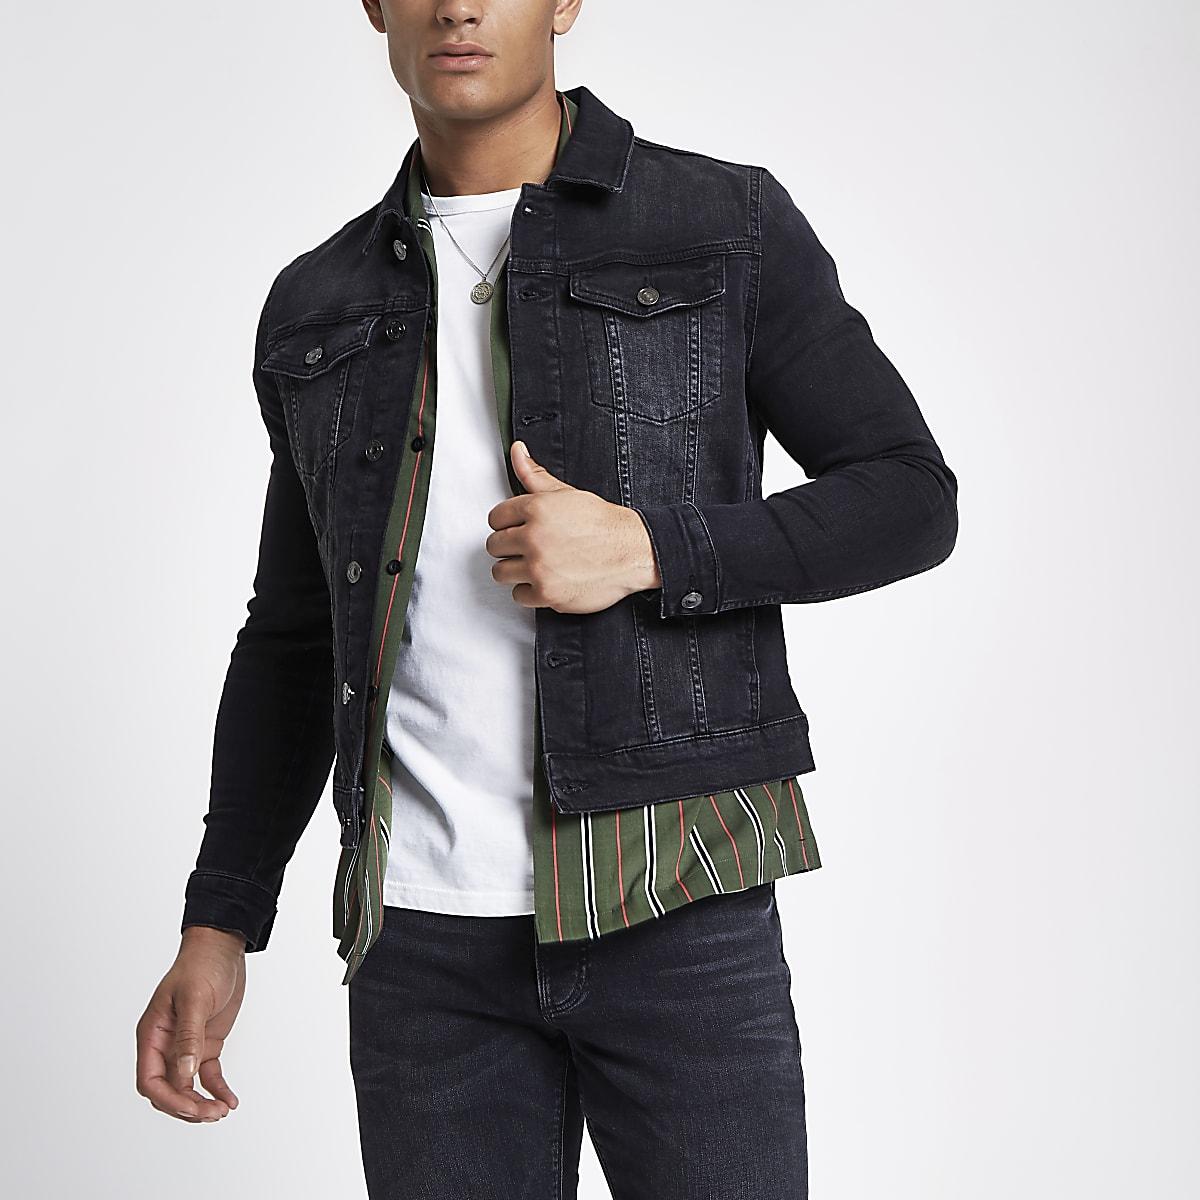 db430639fa22 Black wash muscle fit denim jacket - Jackets - Coats & Jackets - men